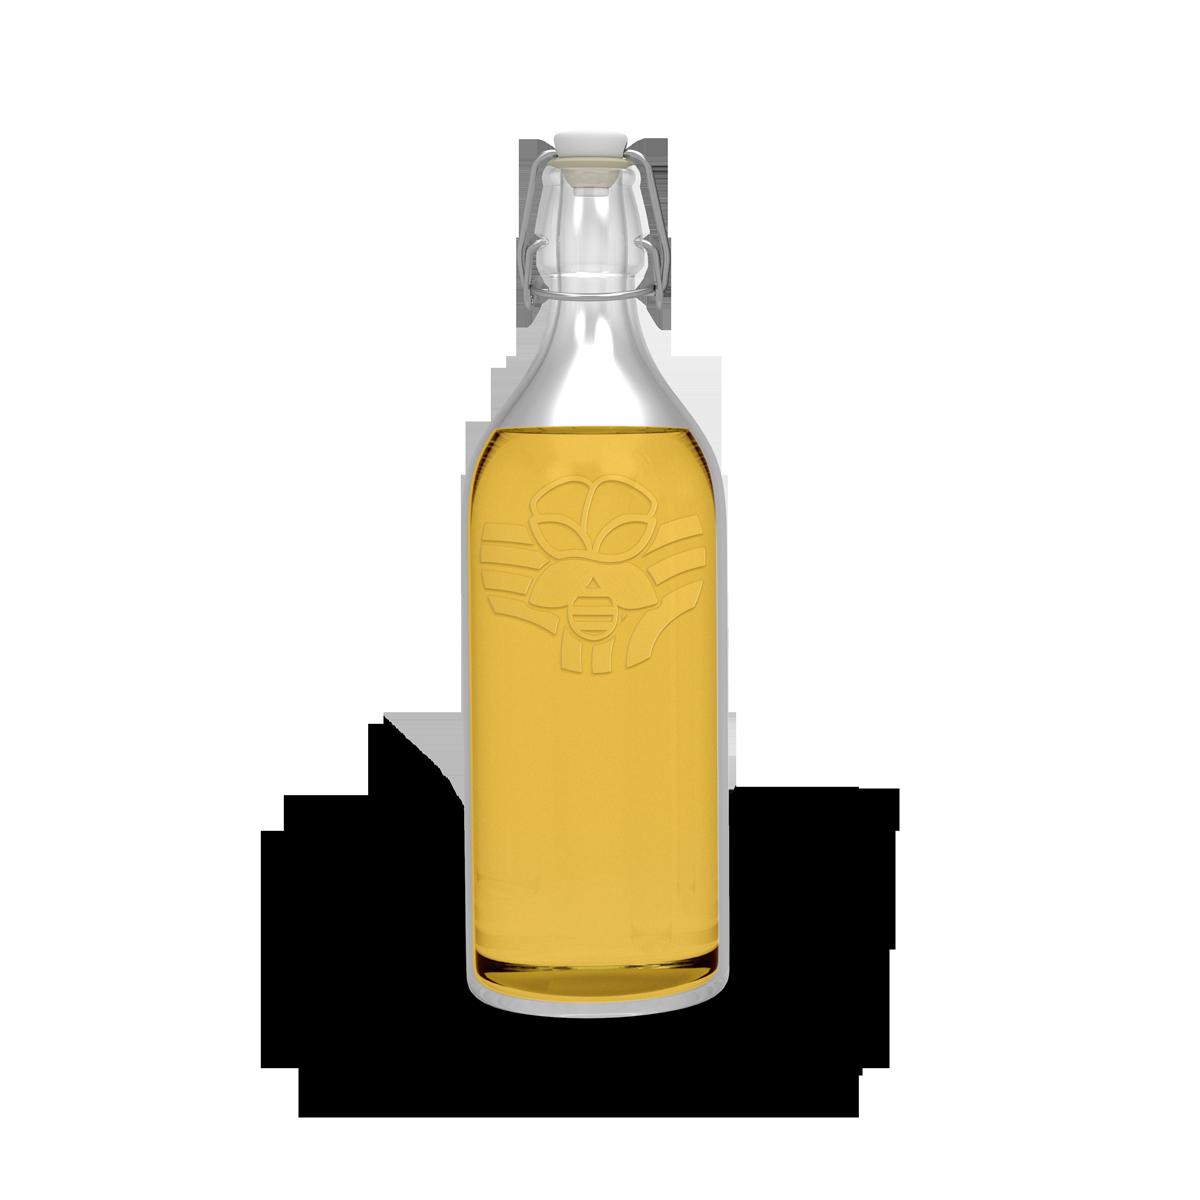 antrobus-bottle-no-label